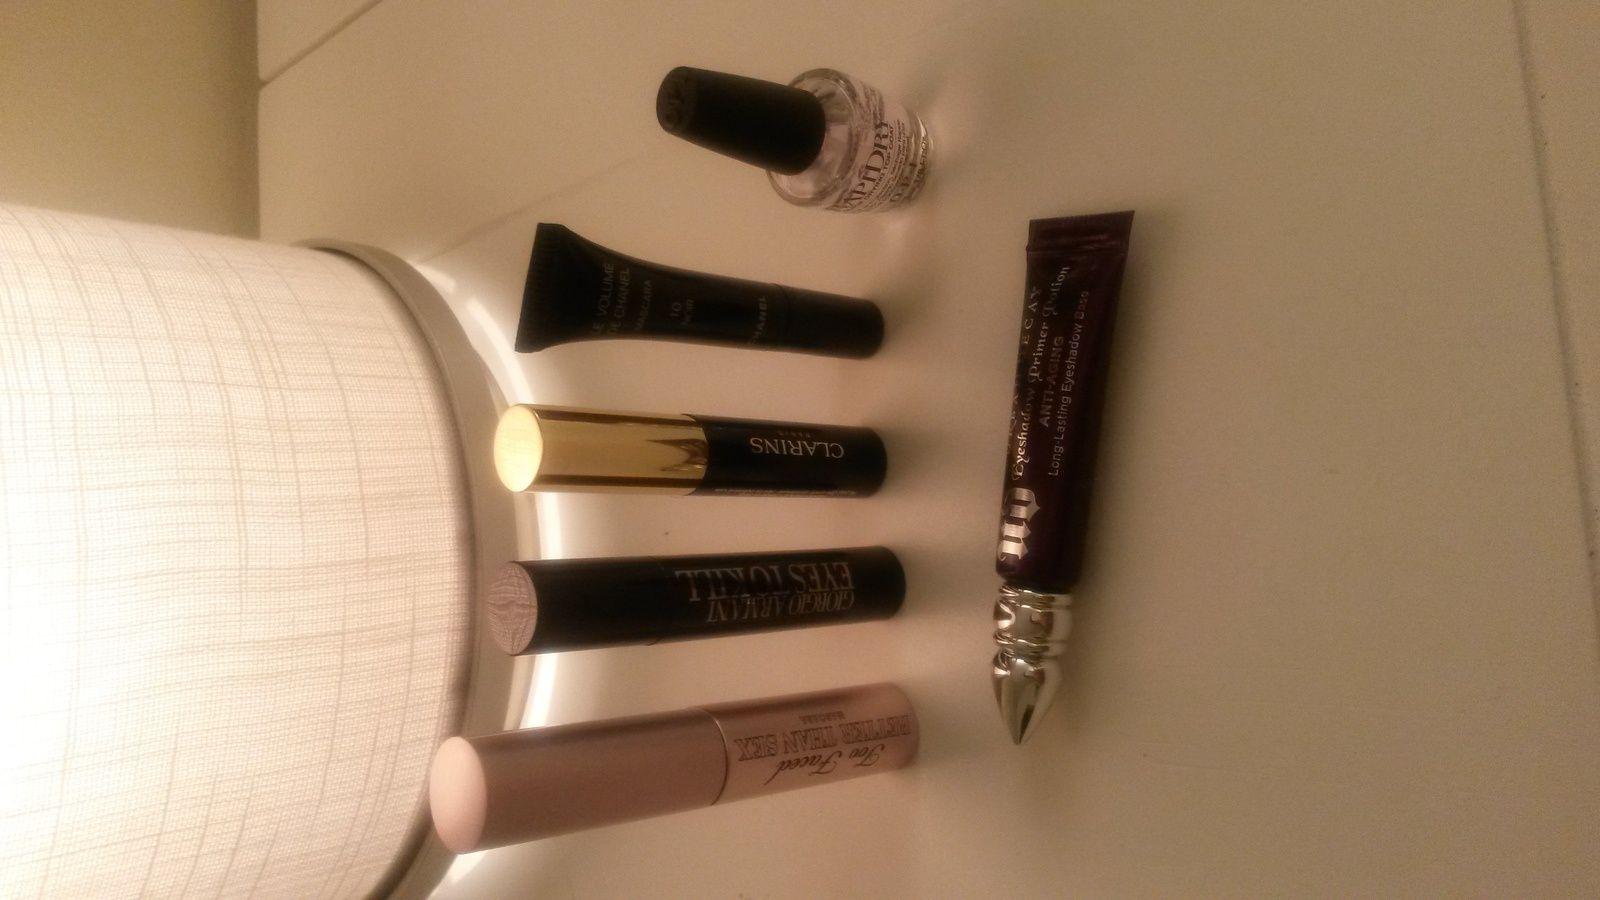 mini mascaras: Too faced, armani, clarins, chanel, le top coat séchage rapide d'OPI et la base UD